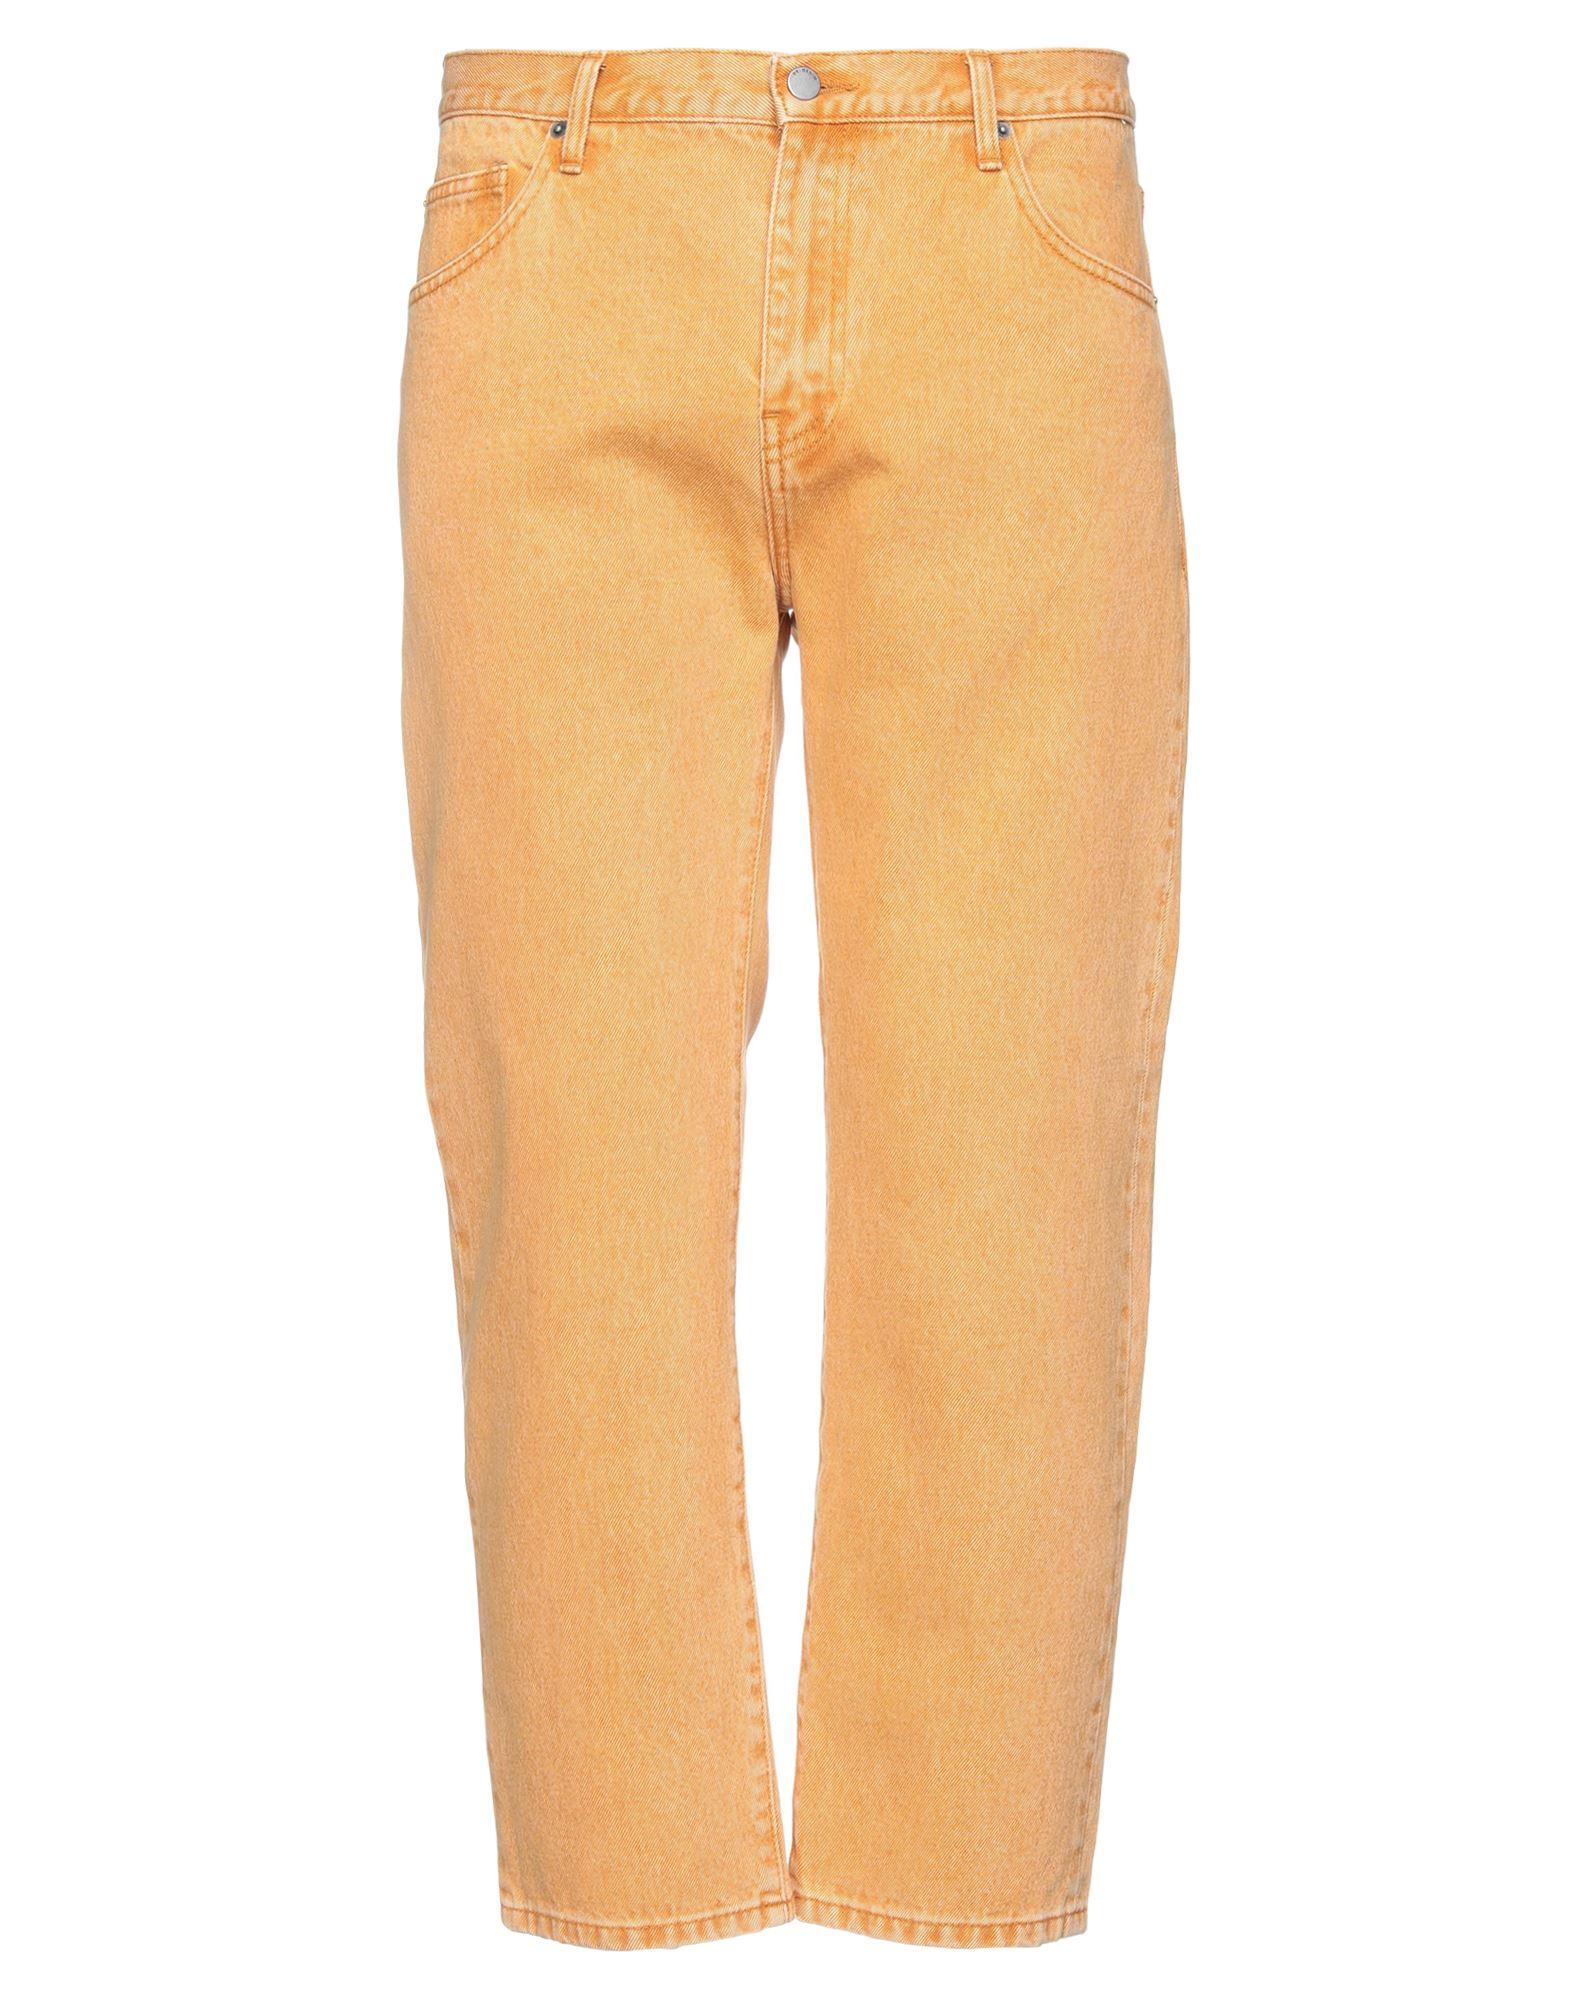 DR. DENIM JEANSMAKERS Укороченные джинсы dr denim jeansmakers комплект белья